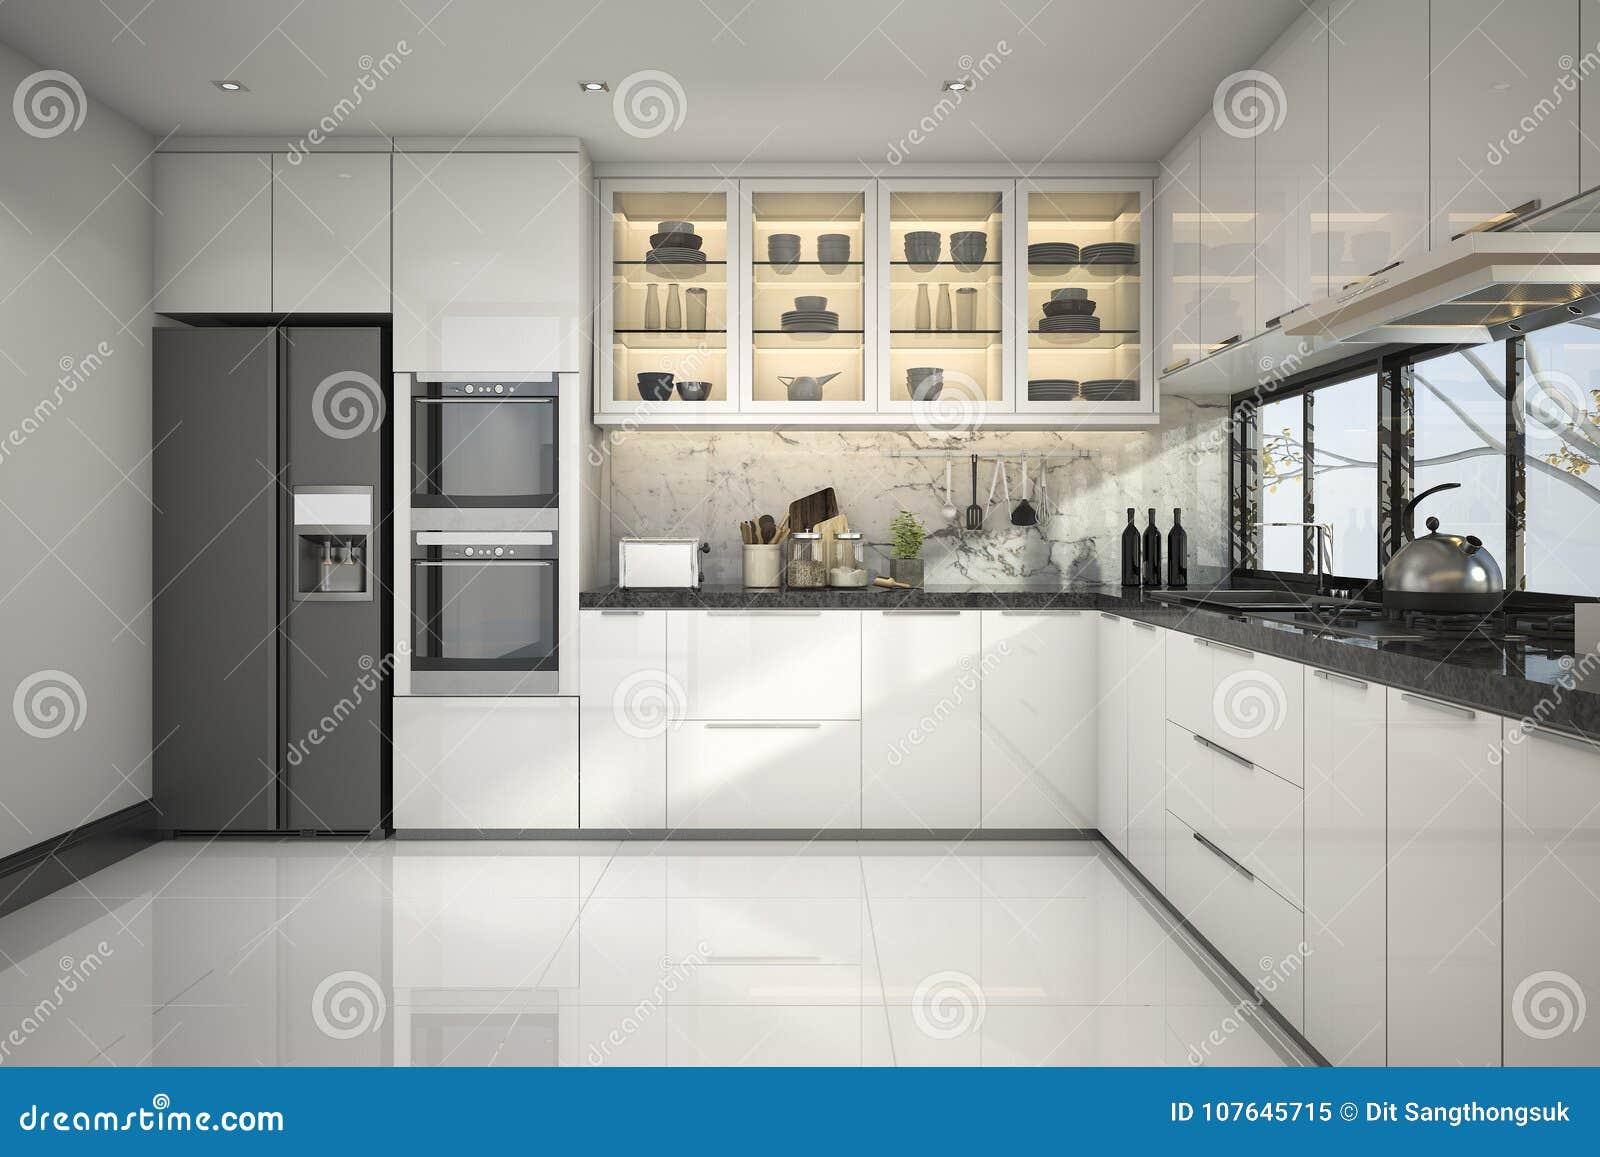 Mooie Witte Keuken : Keukens hl keukens en kasten